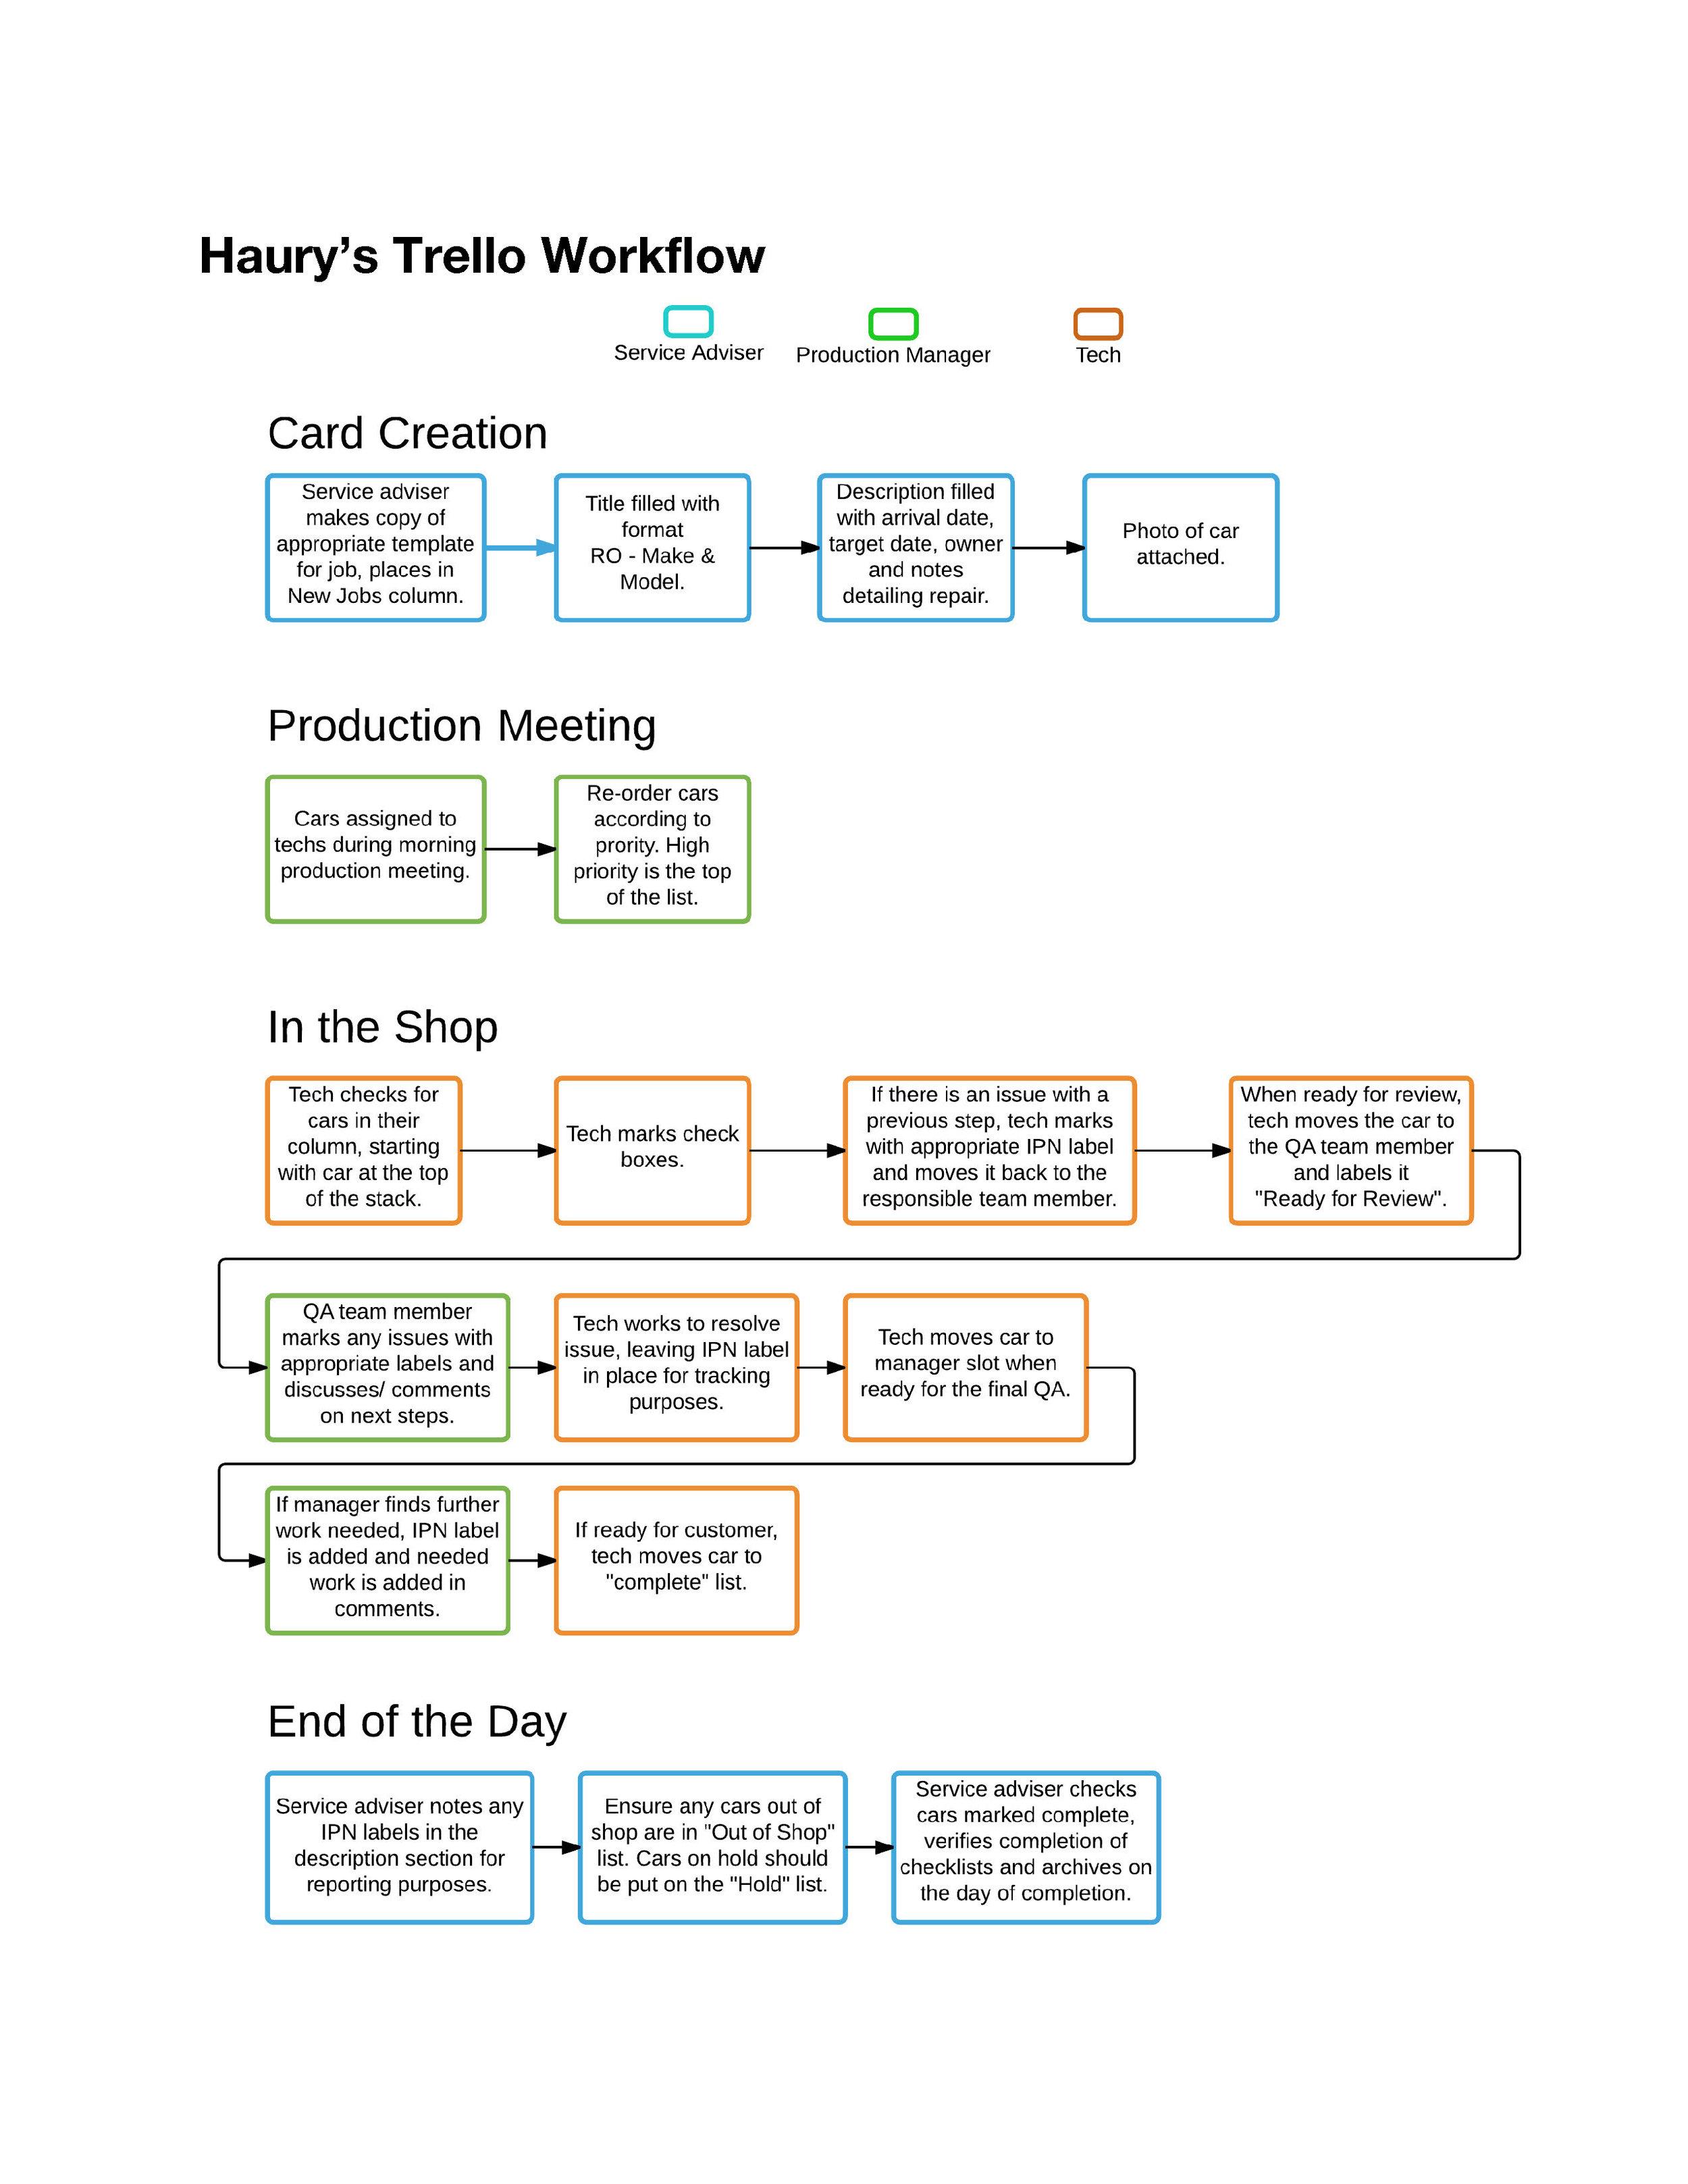 Haury's Training Manual - Flow Chart